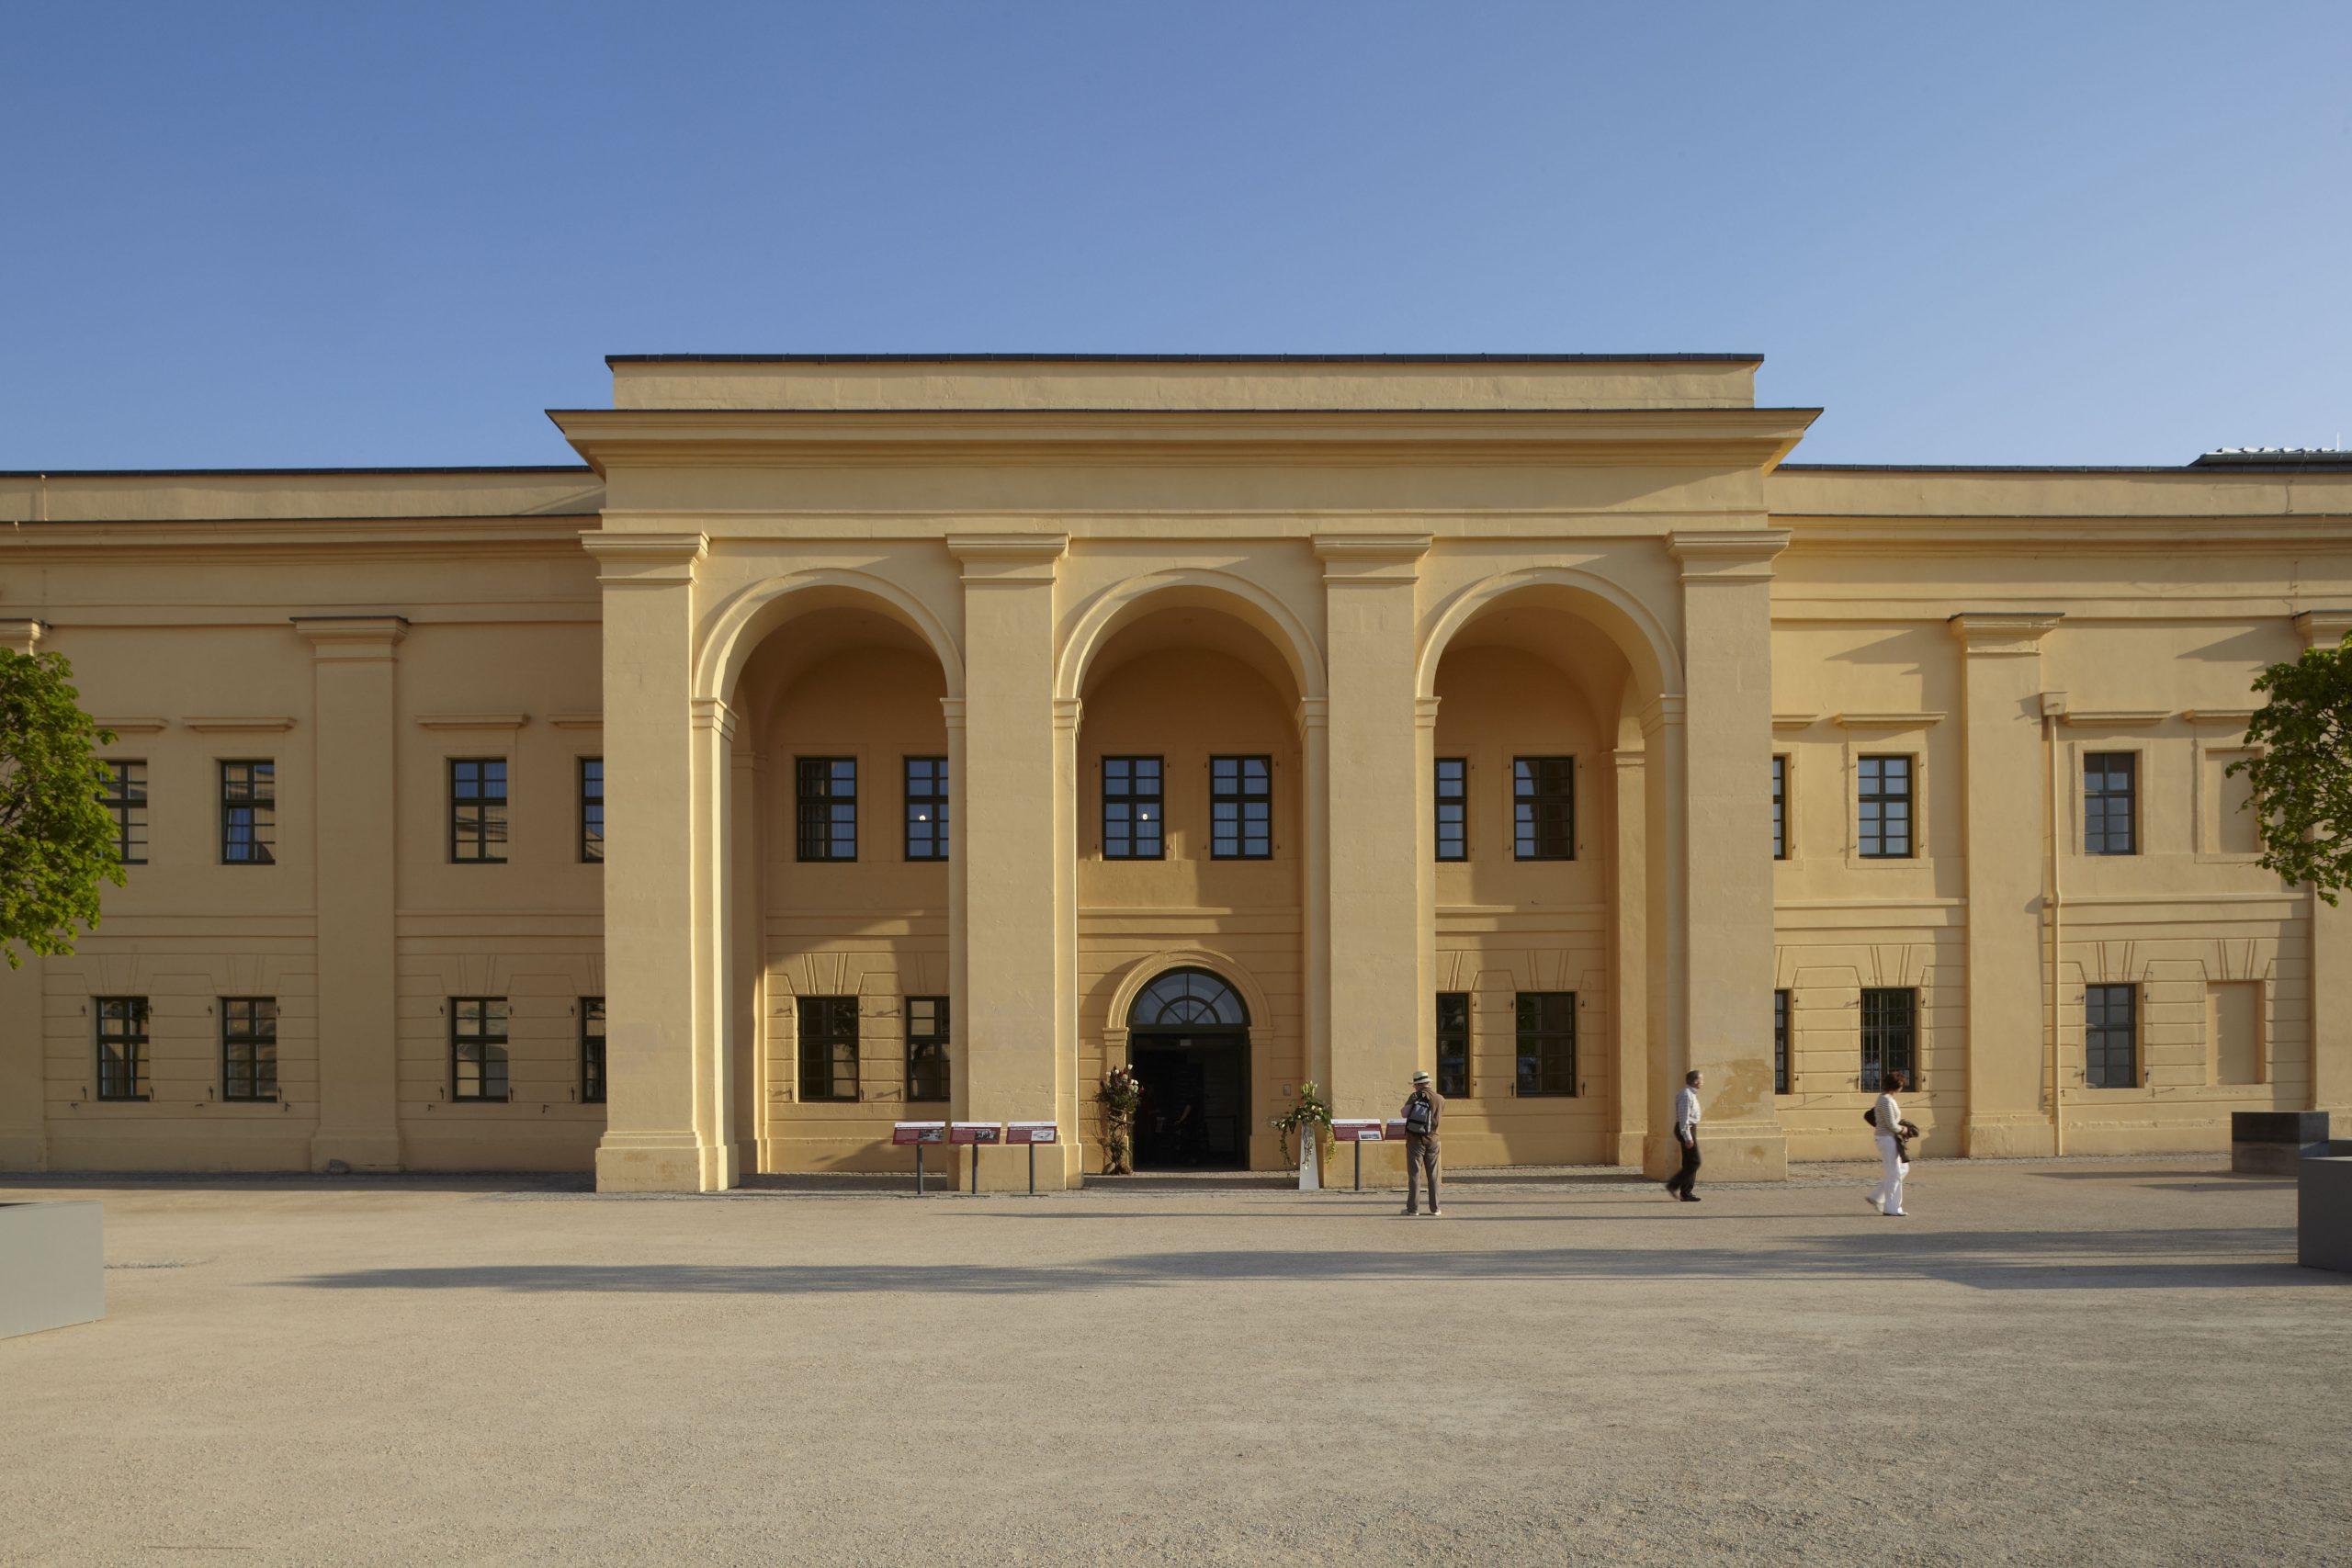 Landesmuseen mit digitalen Highlights am Museumstag